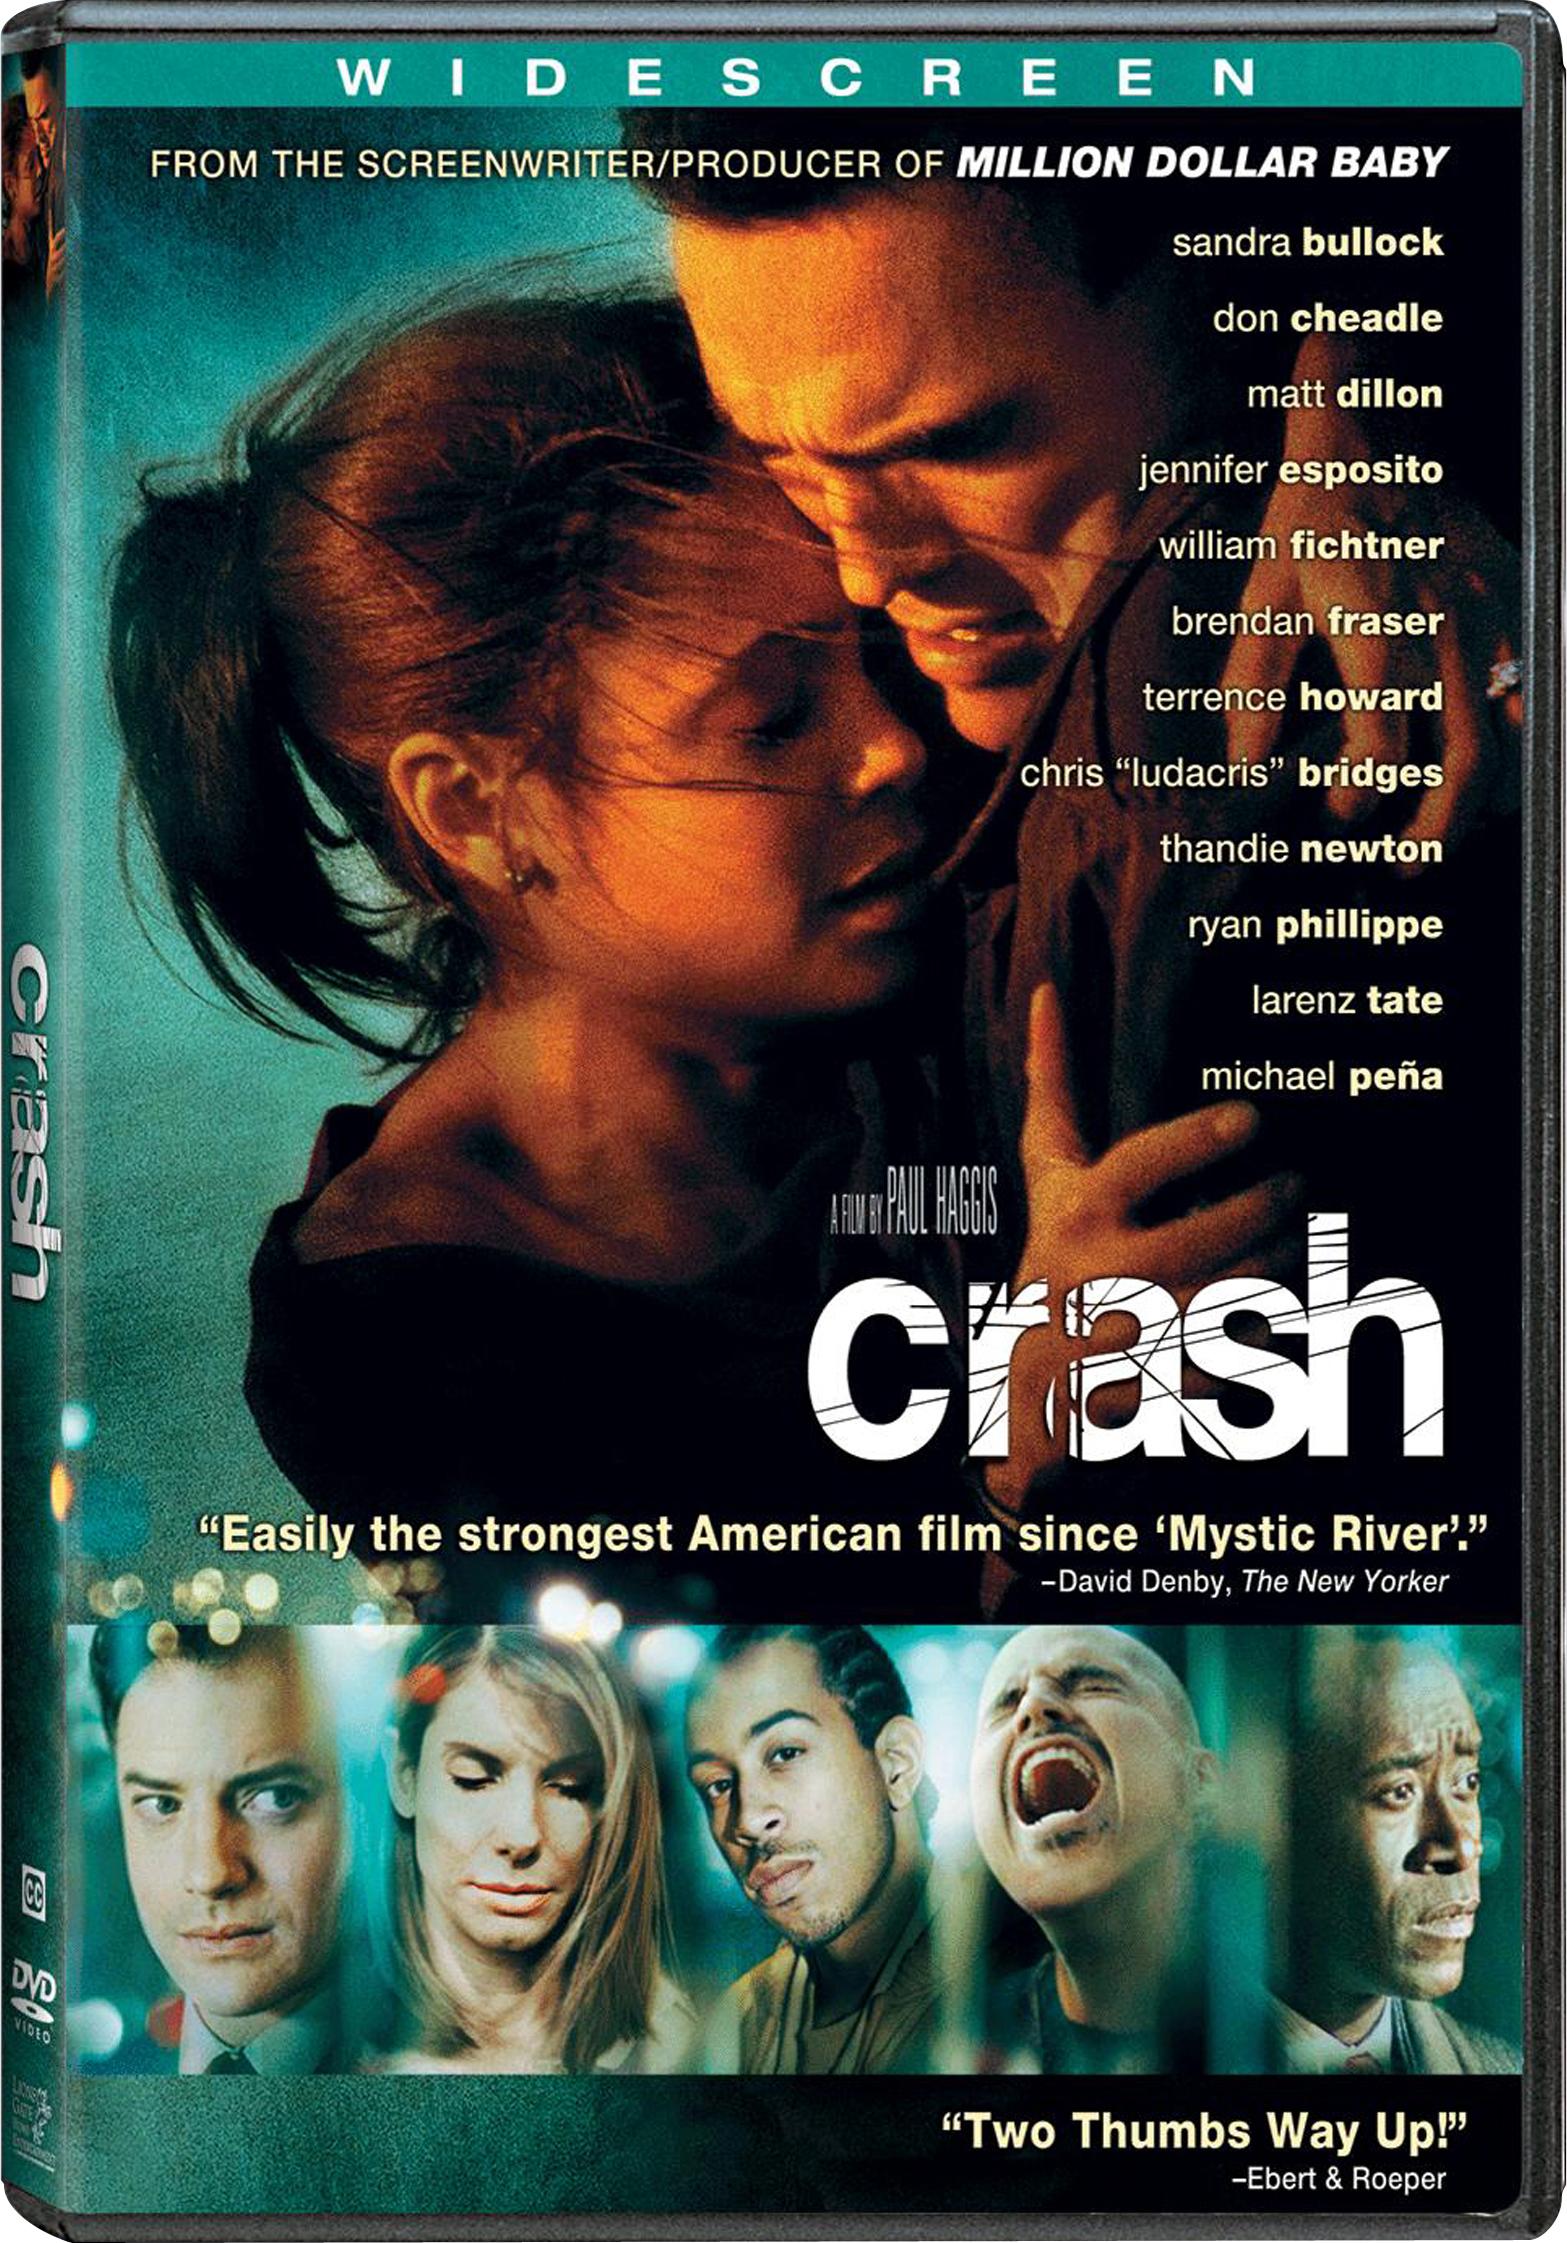 Crash DVD cover